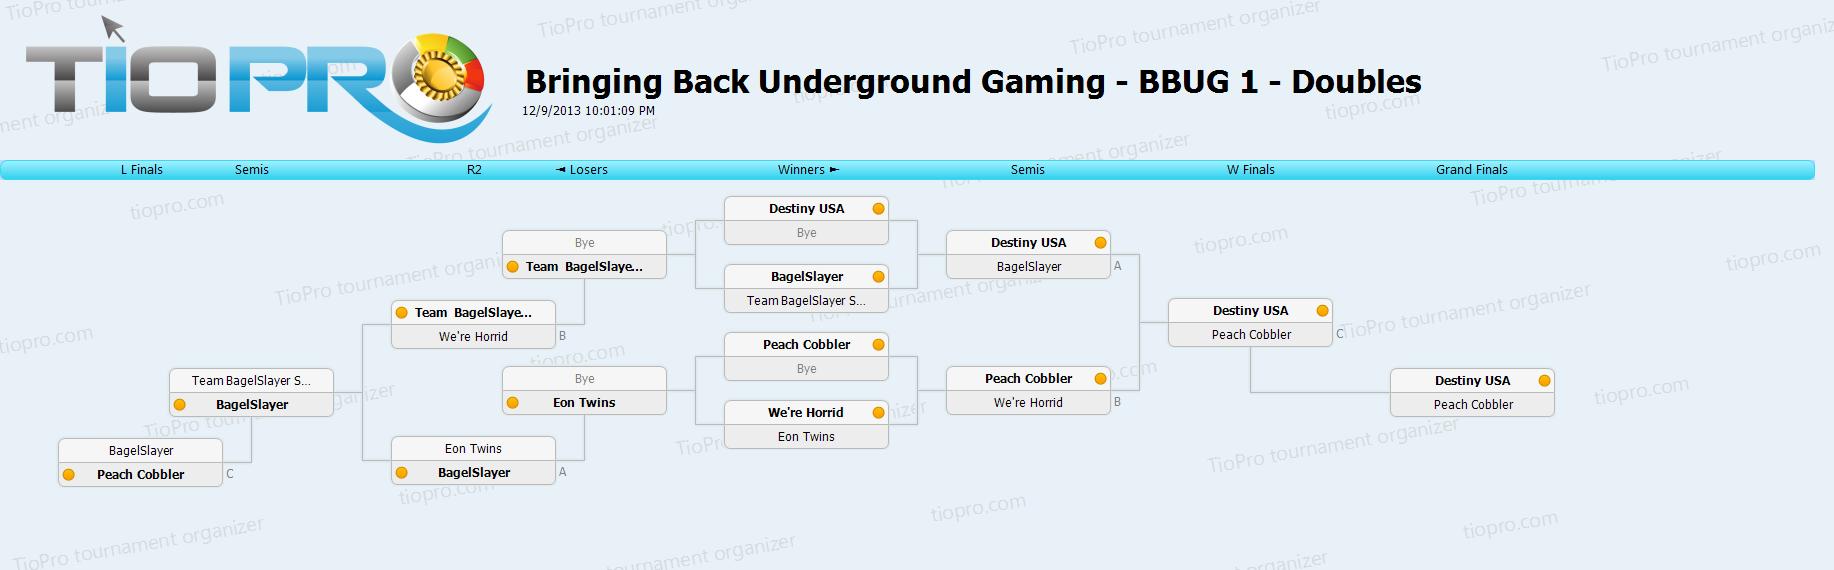 BBUG 1 - Doubles bracket.png